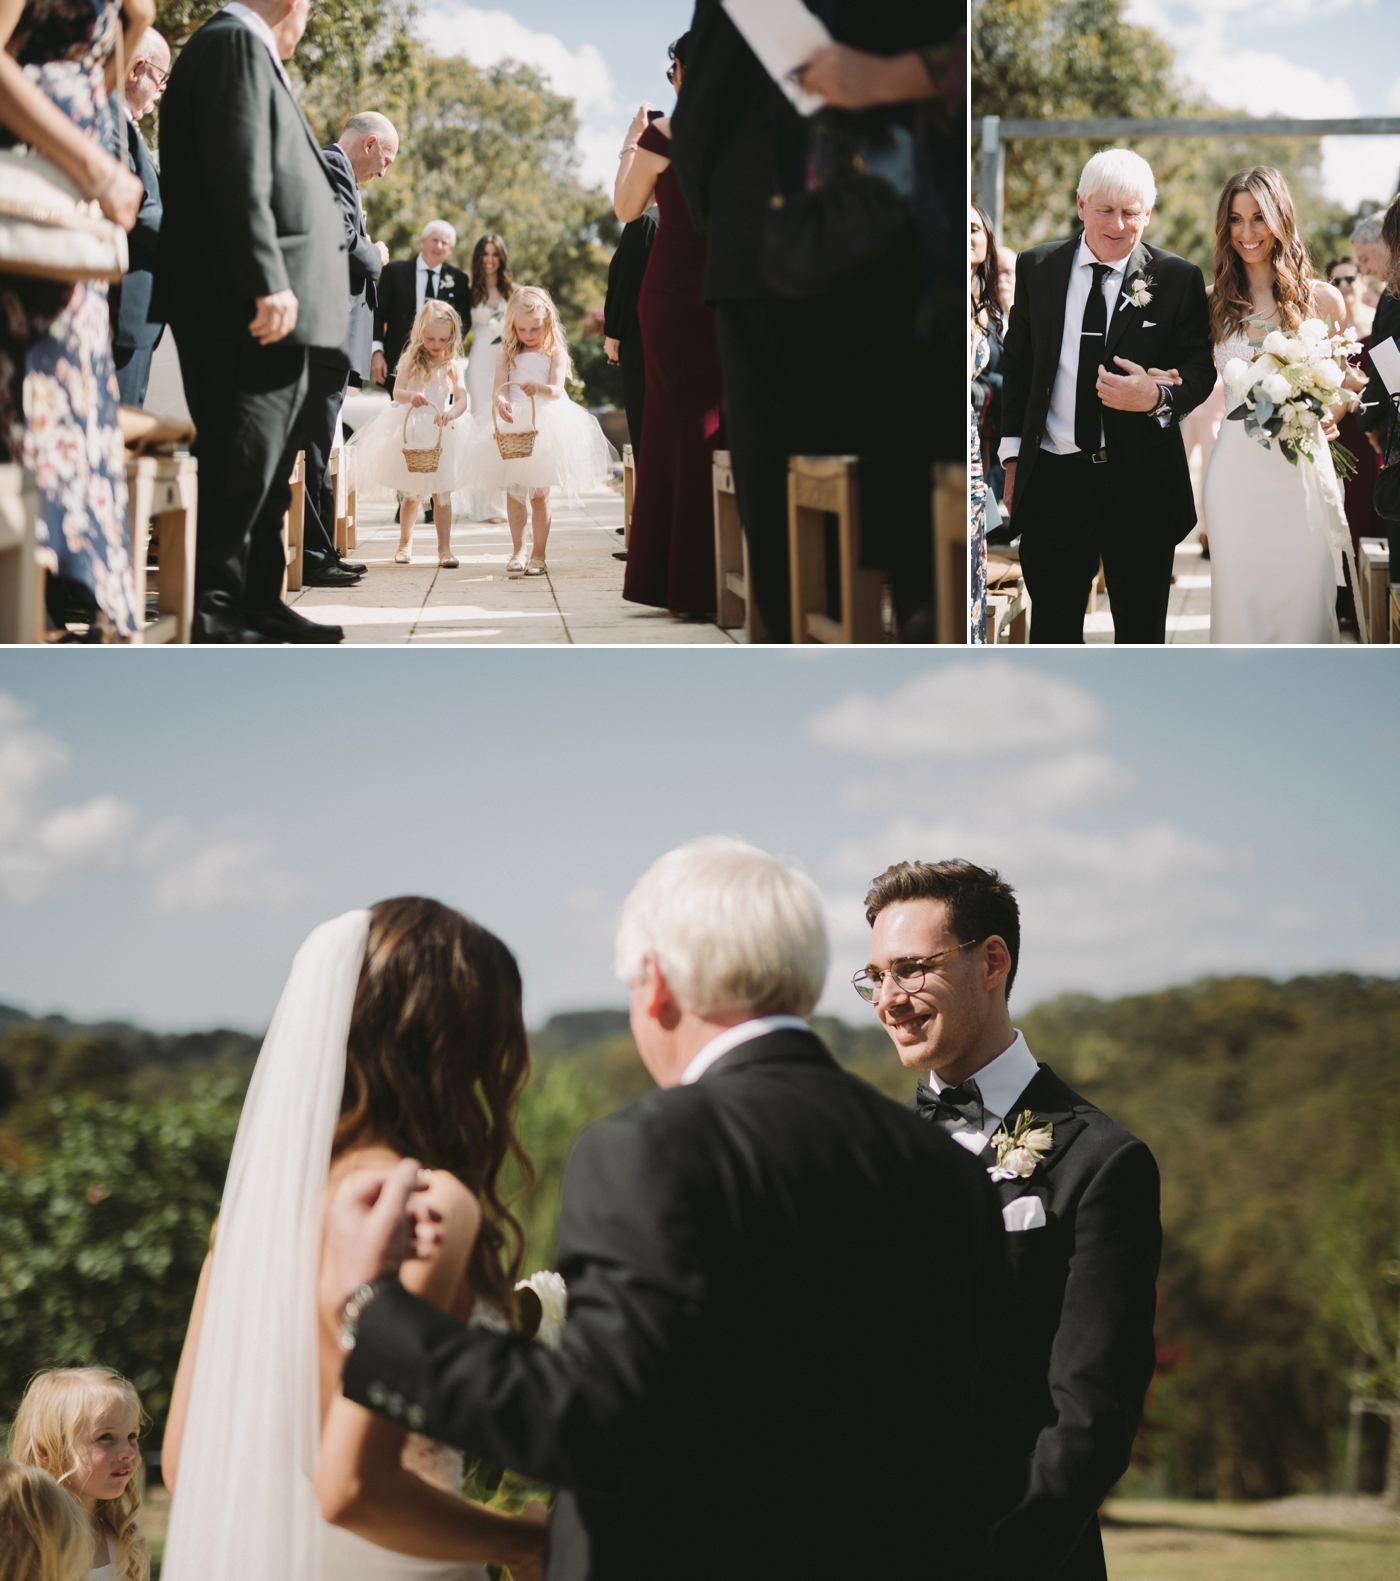 Katie and Ben - Natural Wedding Photography in Adelaide - Beautiful, Candid Wedding Photographer - Adelaide Hills Wedding - Katherine Schultz - www.katherineschultzphotography.com_0027.jpg